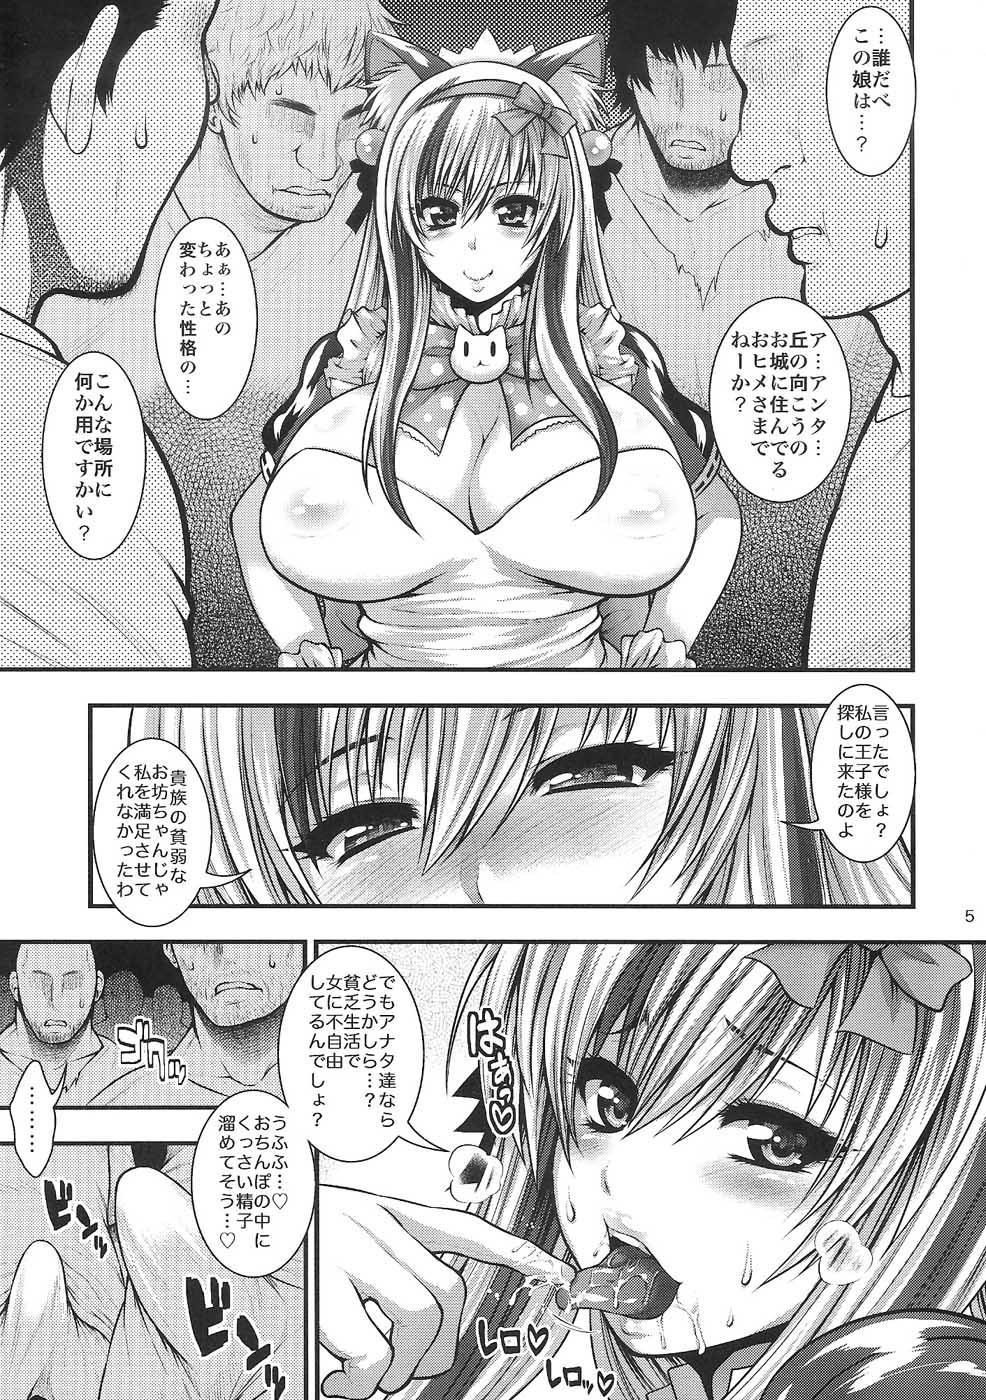 Chinpo ni Totsugeki! Denpa Hime! 3